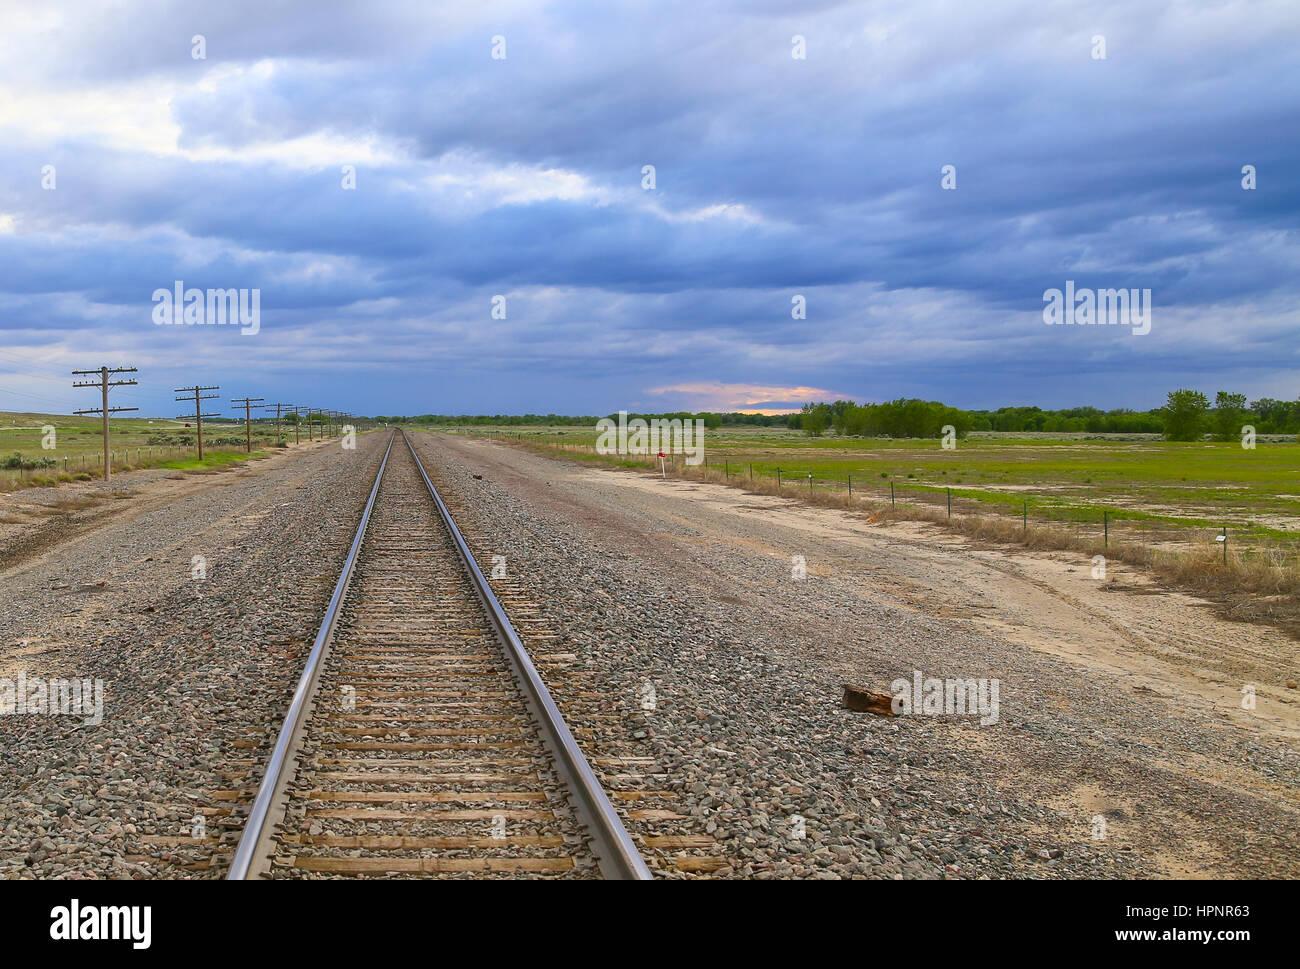 North Dakota Abandoned Rail Lines